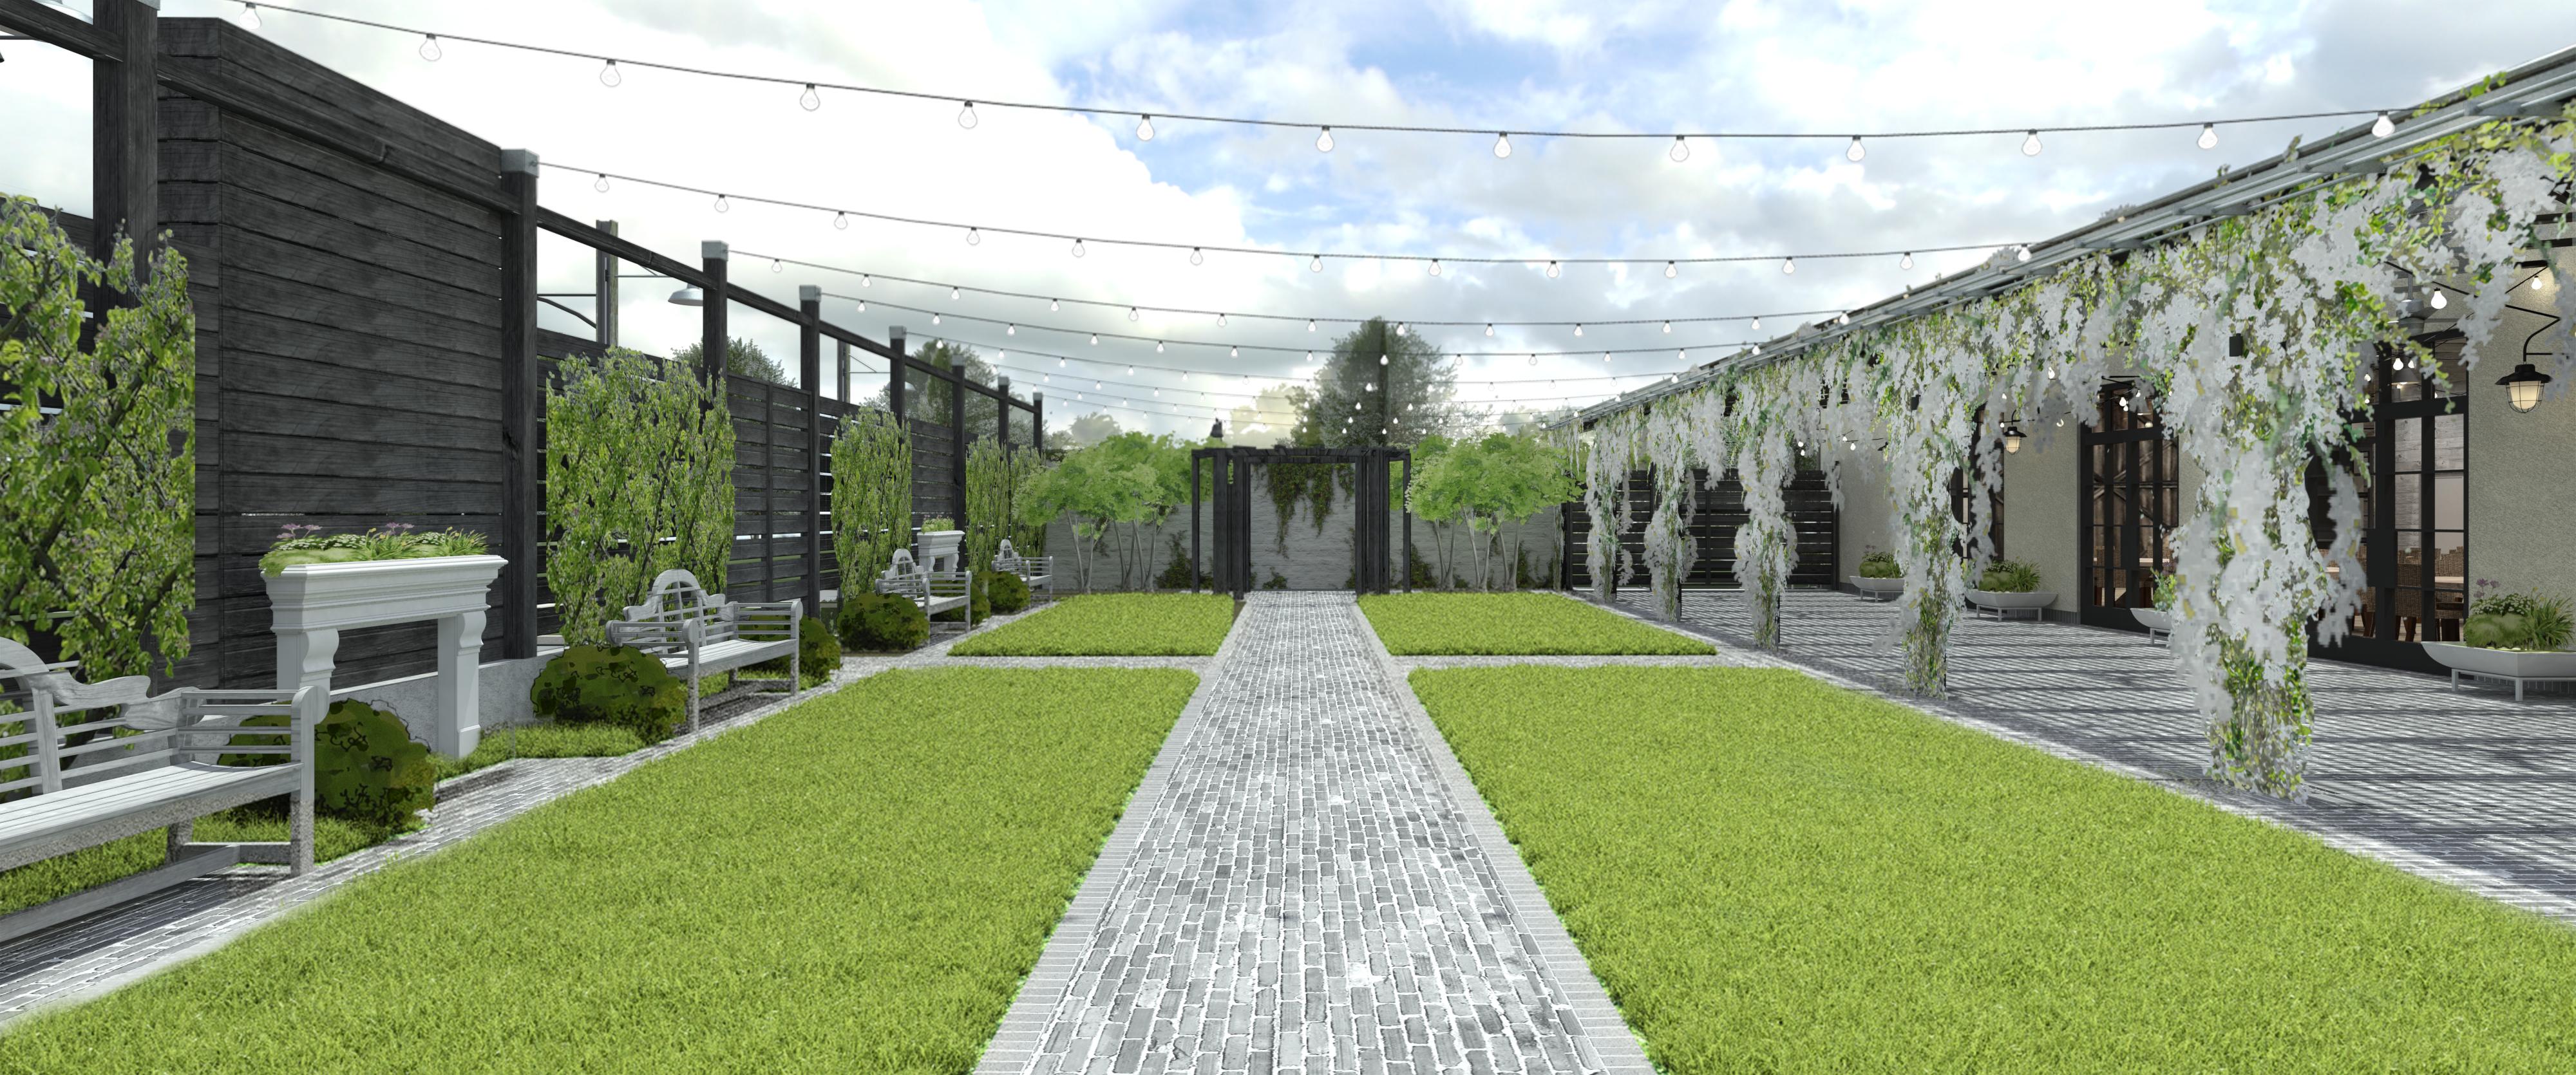 Elegant URBNu0027s Dreamy Terrain Gardens To Open At Devon Yard In Fall 2018   Curbed  Phillyclockmenumore Arrow : The Venue Will Be Lush, Lavish, And All Around  ...